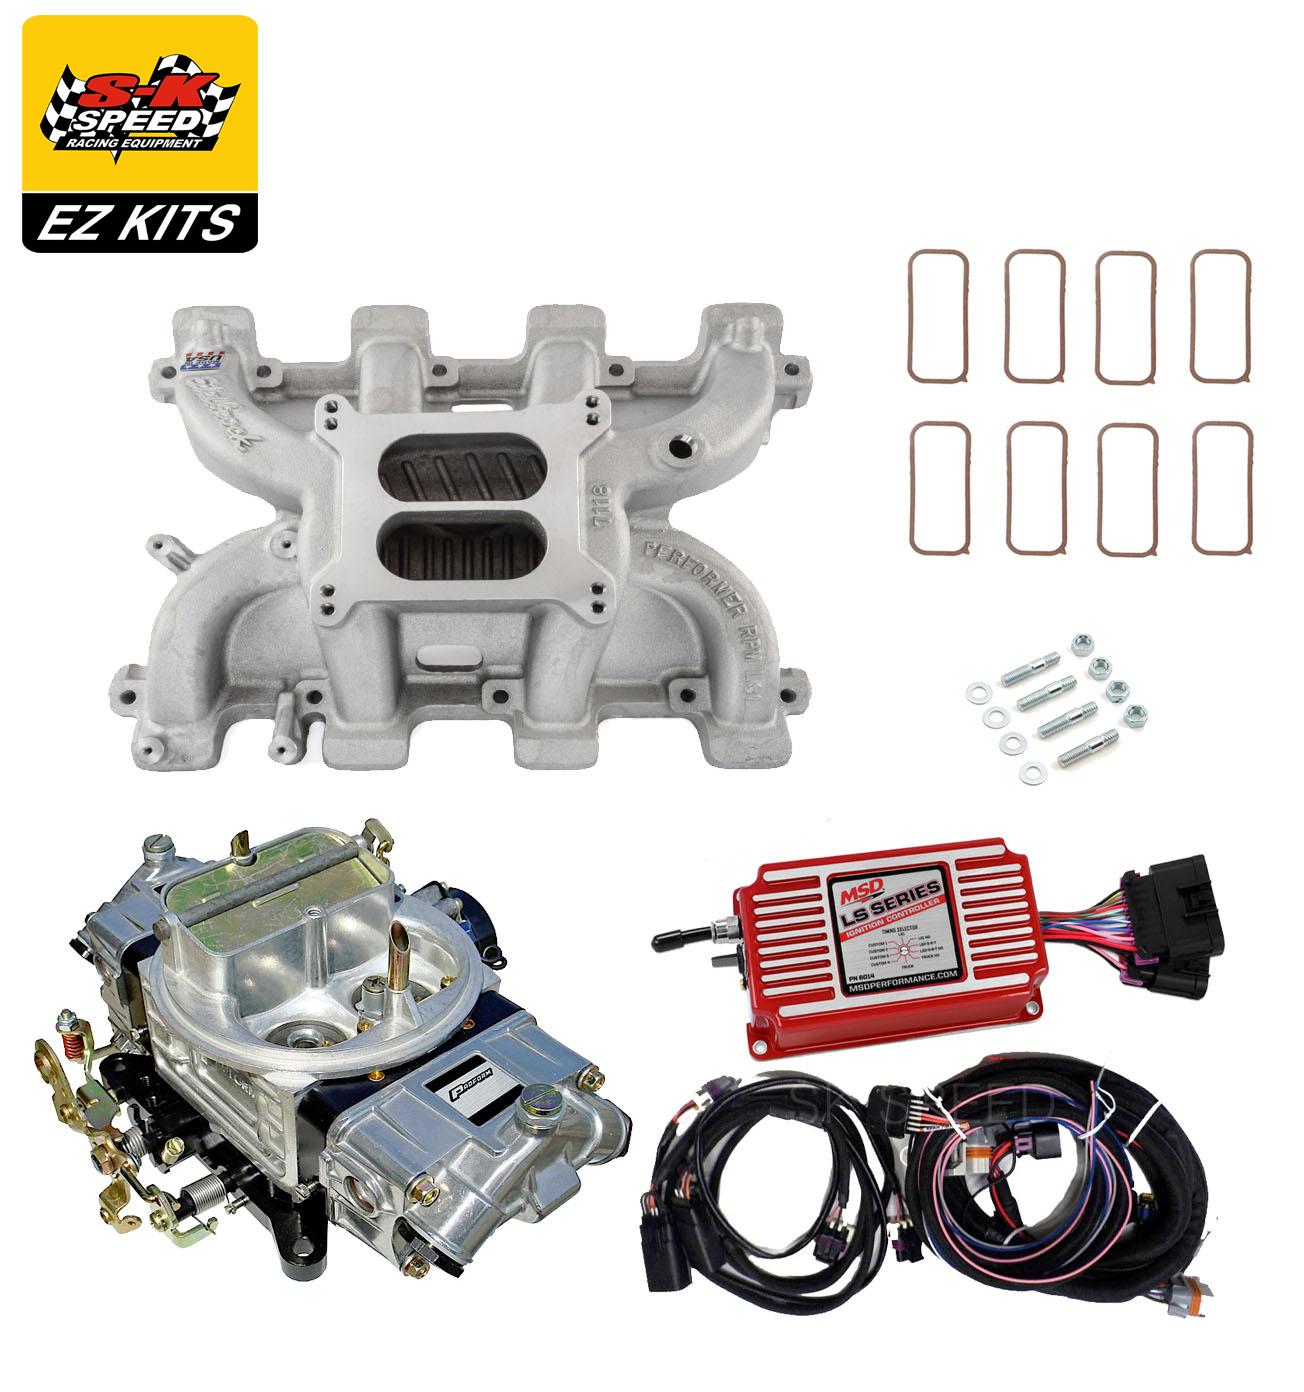 Details about LS1 Carb Intake Kit - Edelbrock RPM Intake/MSD 6014  Ignition/Proform 750 Carb